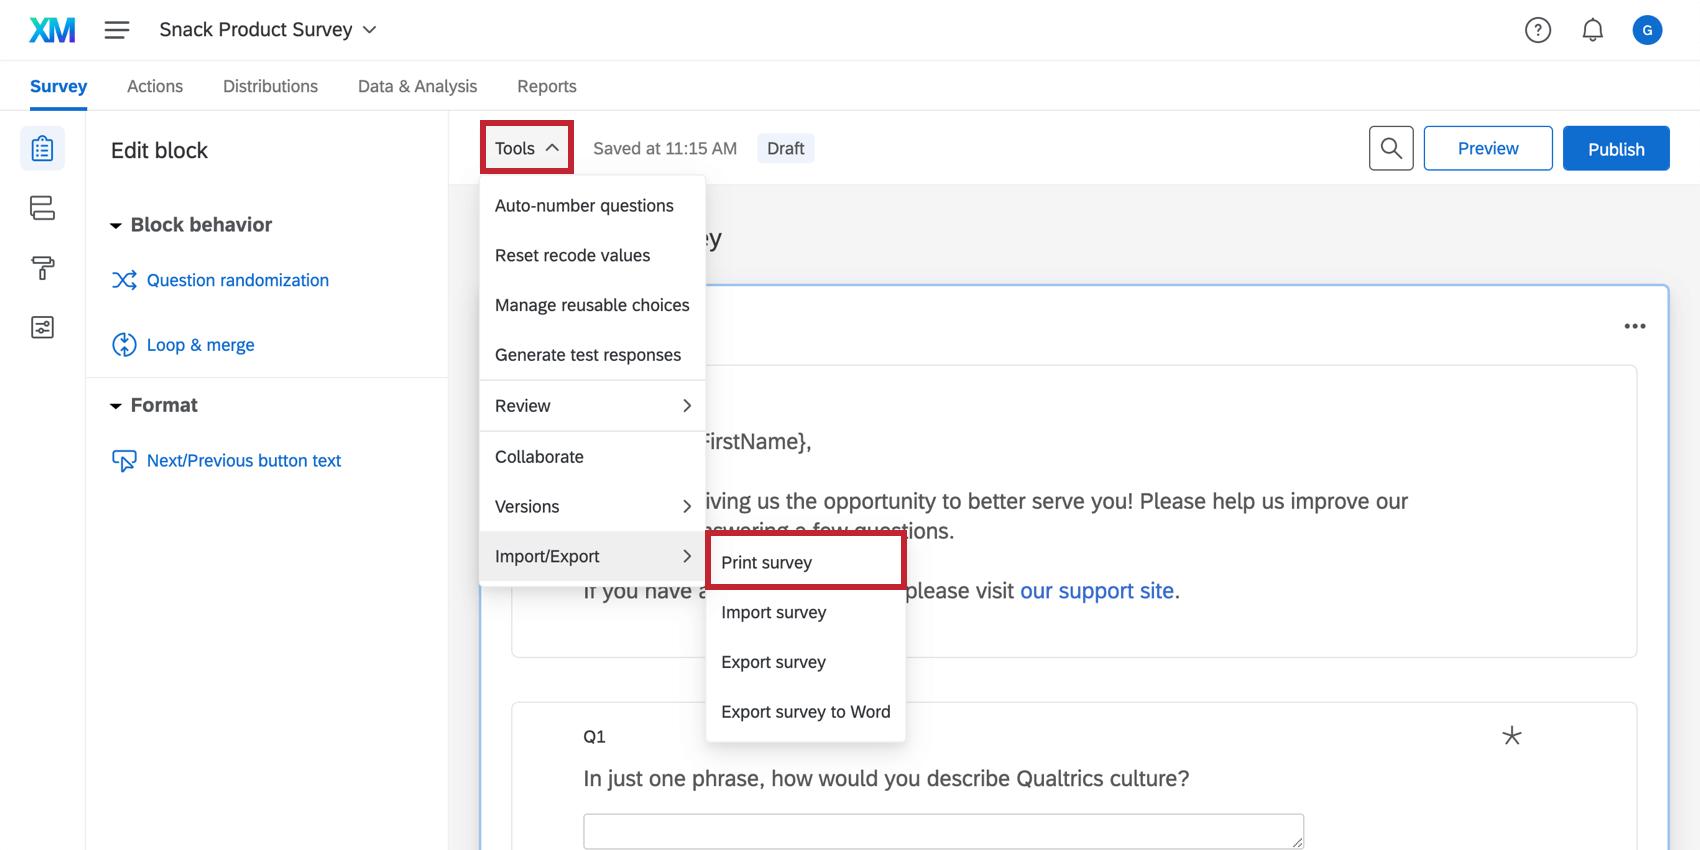 Print survey option in the Tools menu